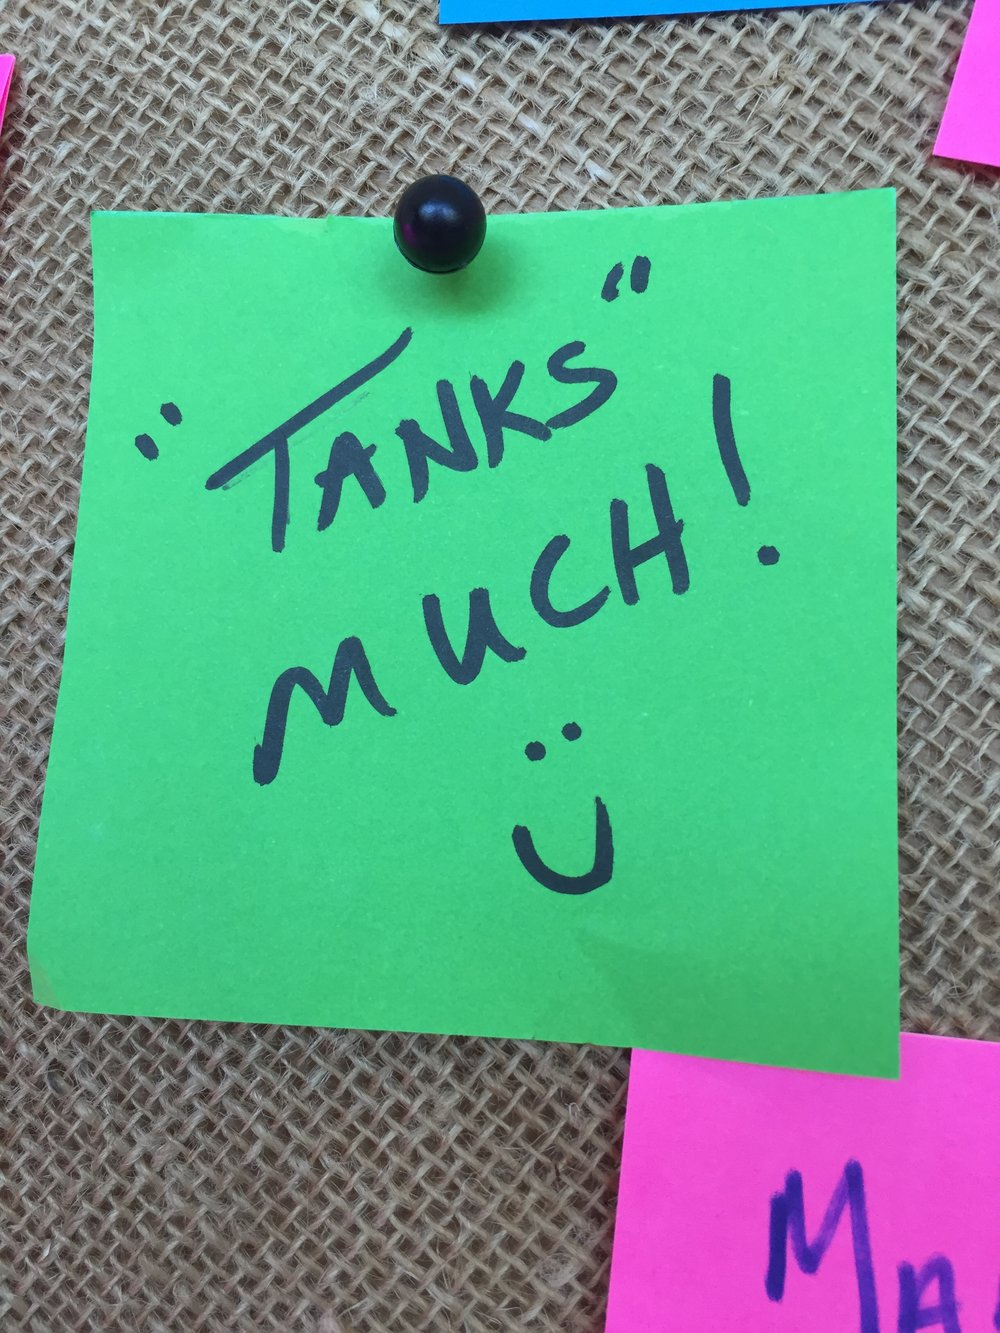 Tanks-much